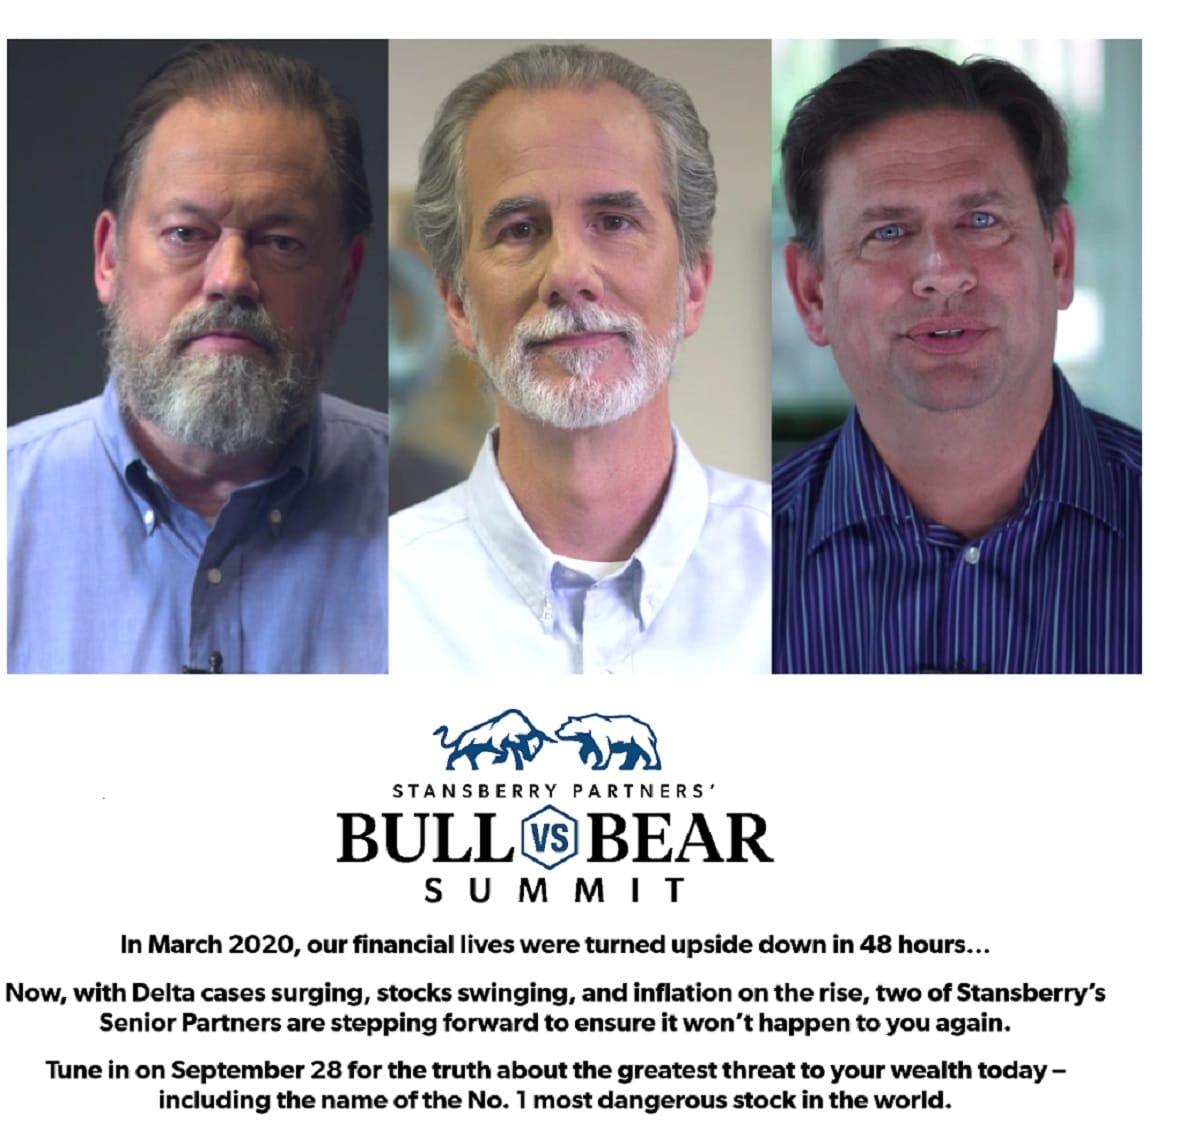 Stansberry Partners Bull vs. Bear Summit